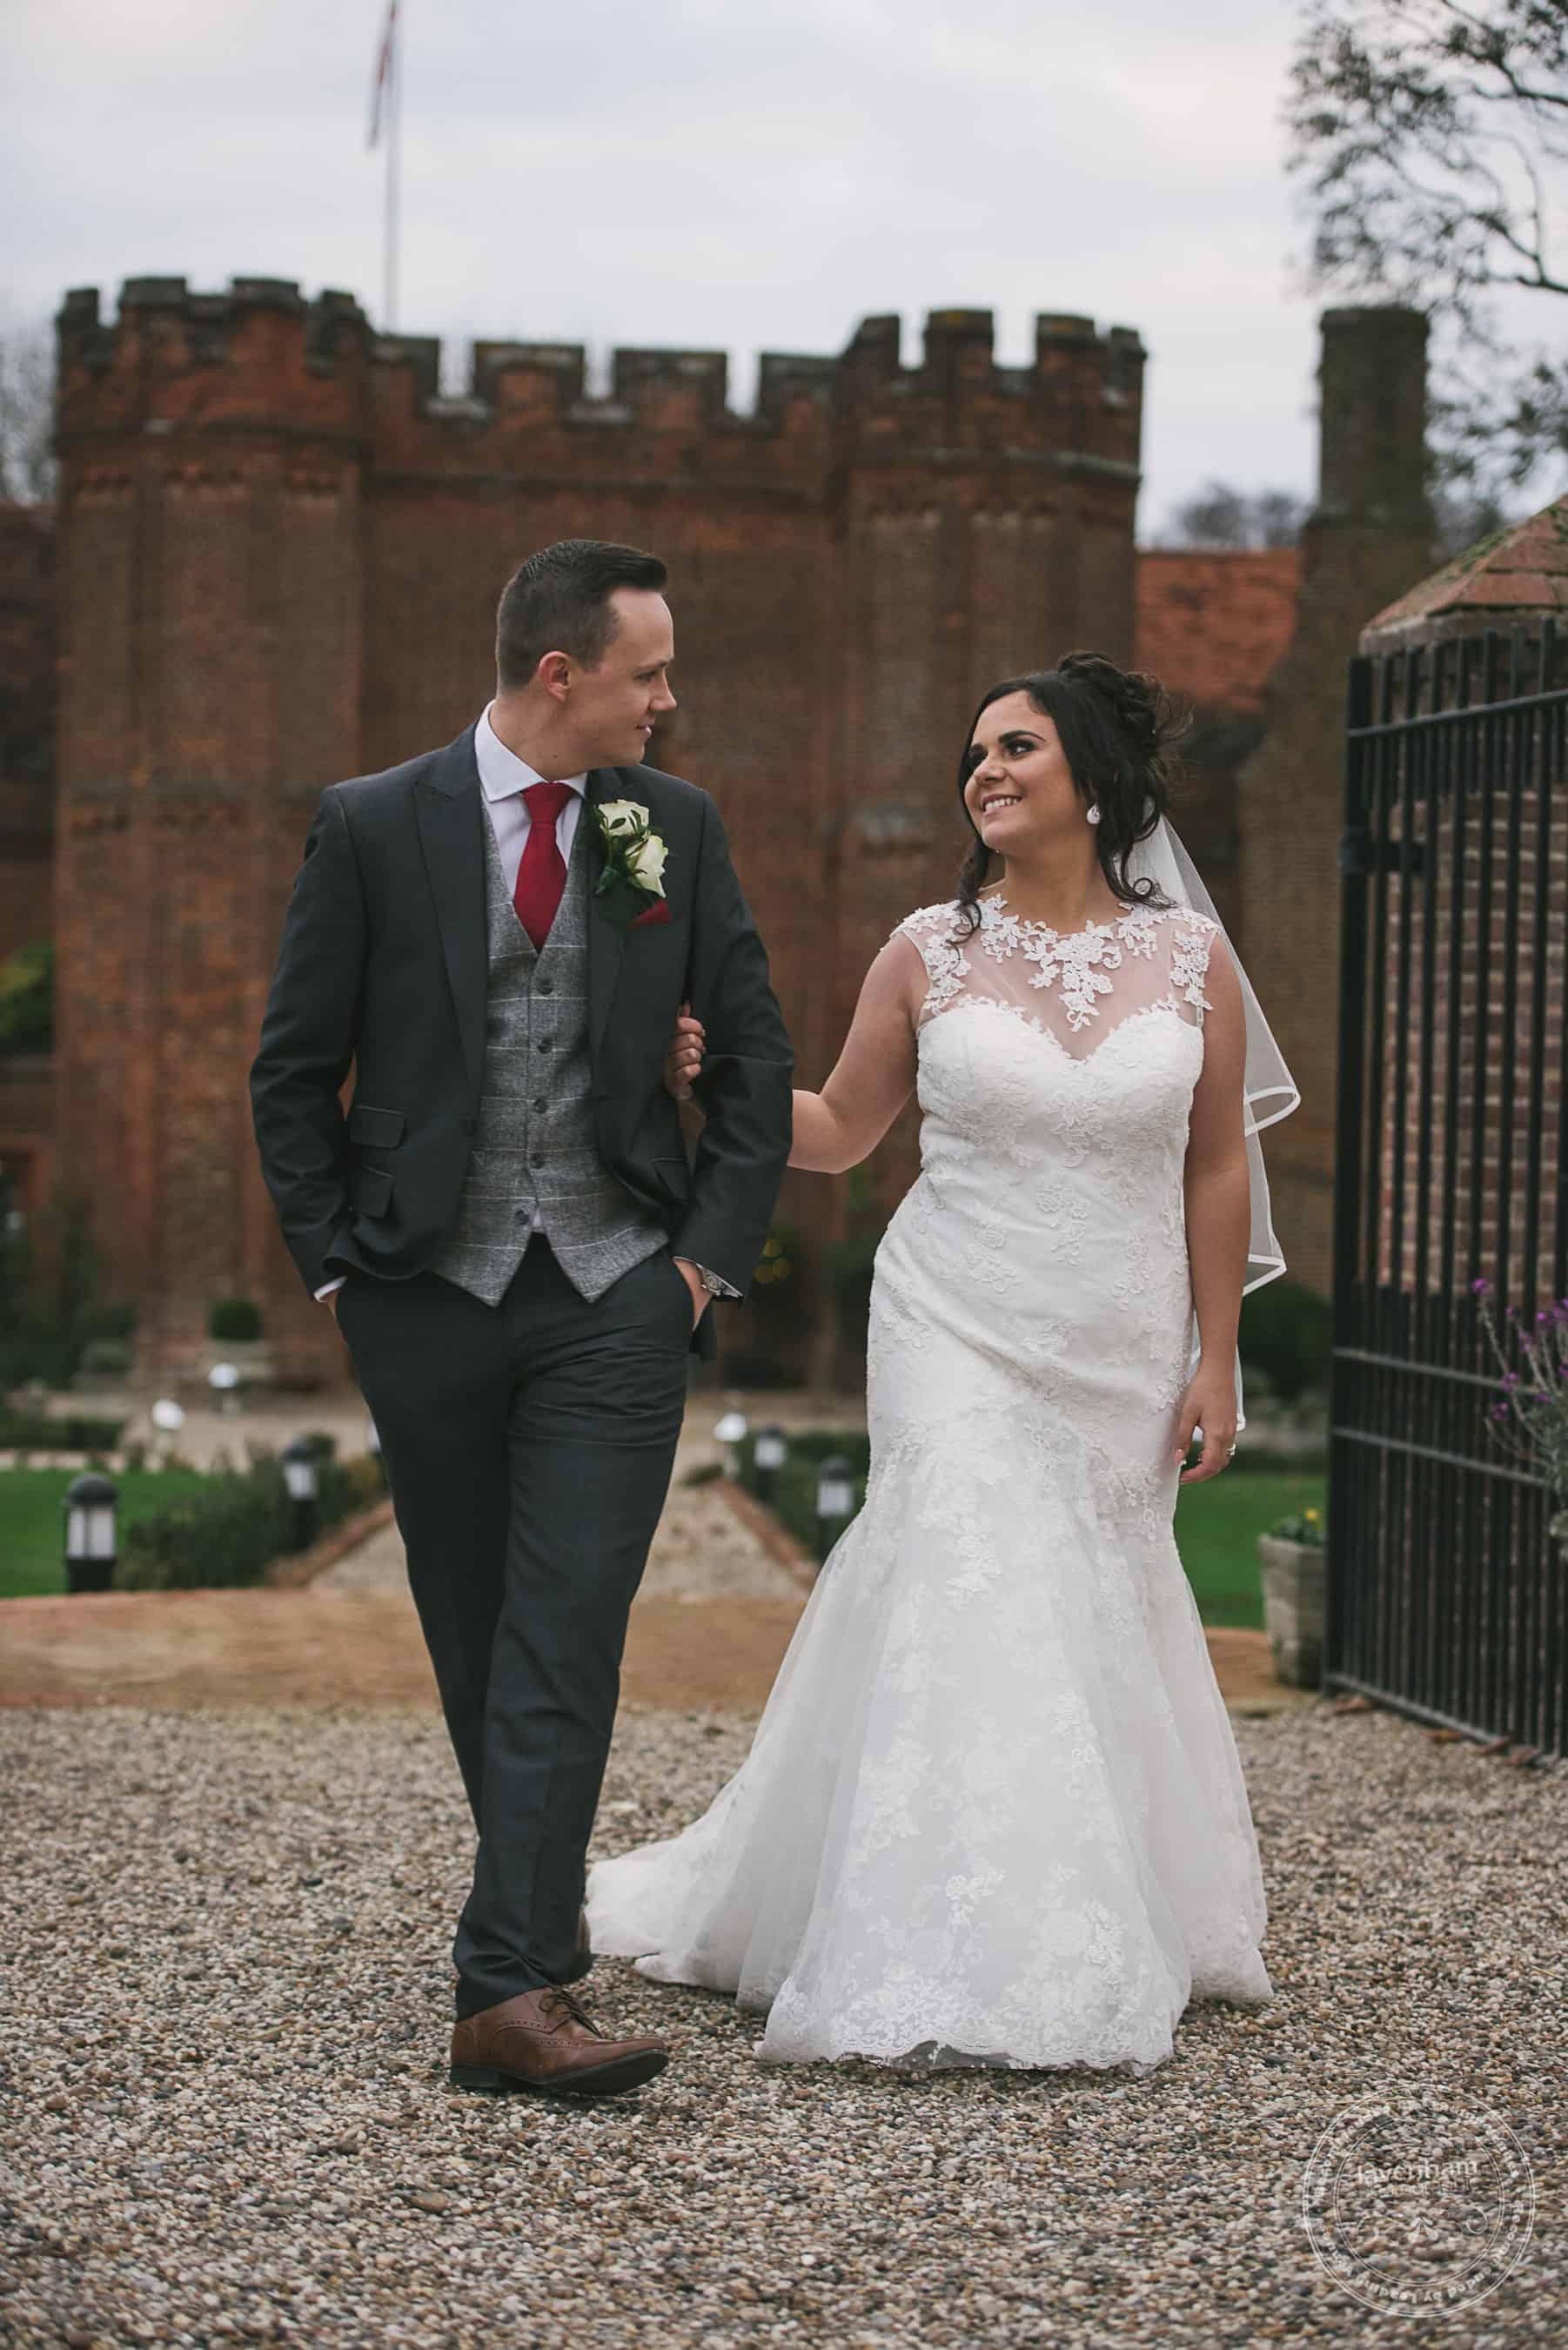 251118 Leez Priory Wedding Photography by Lavenham Photographic 101